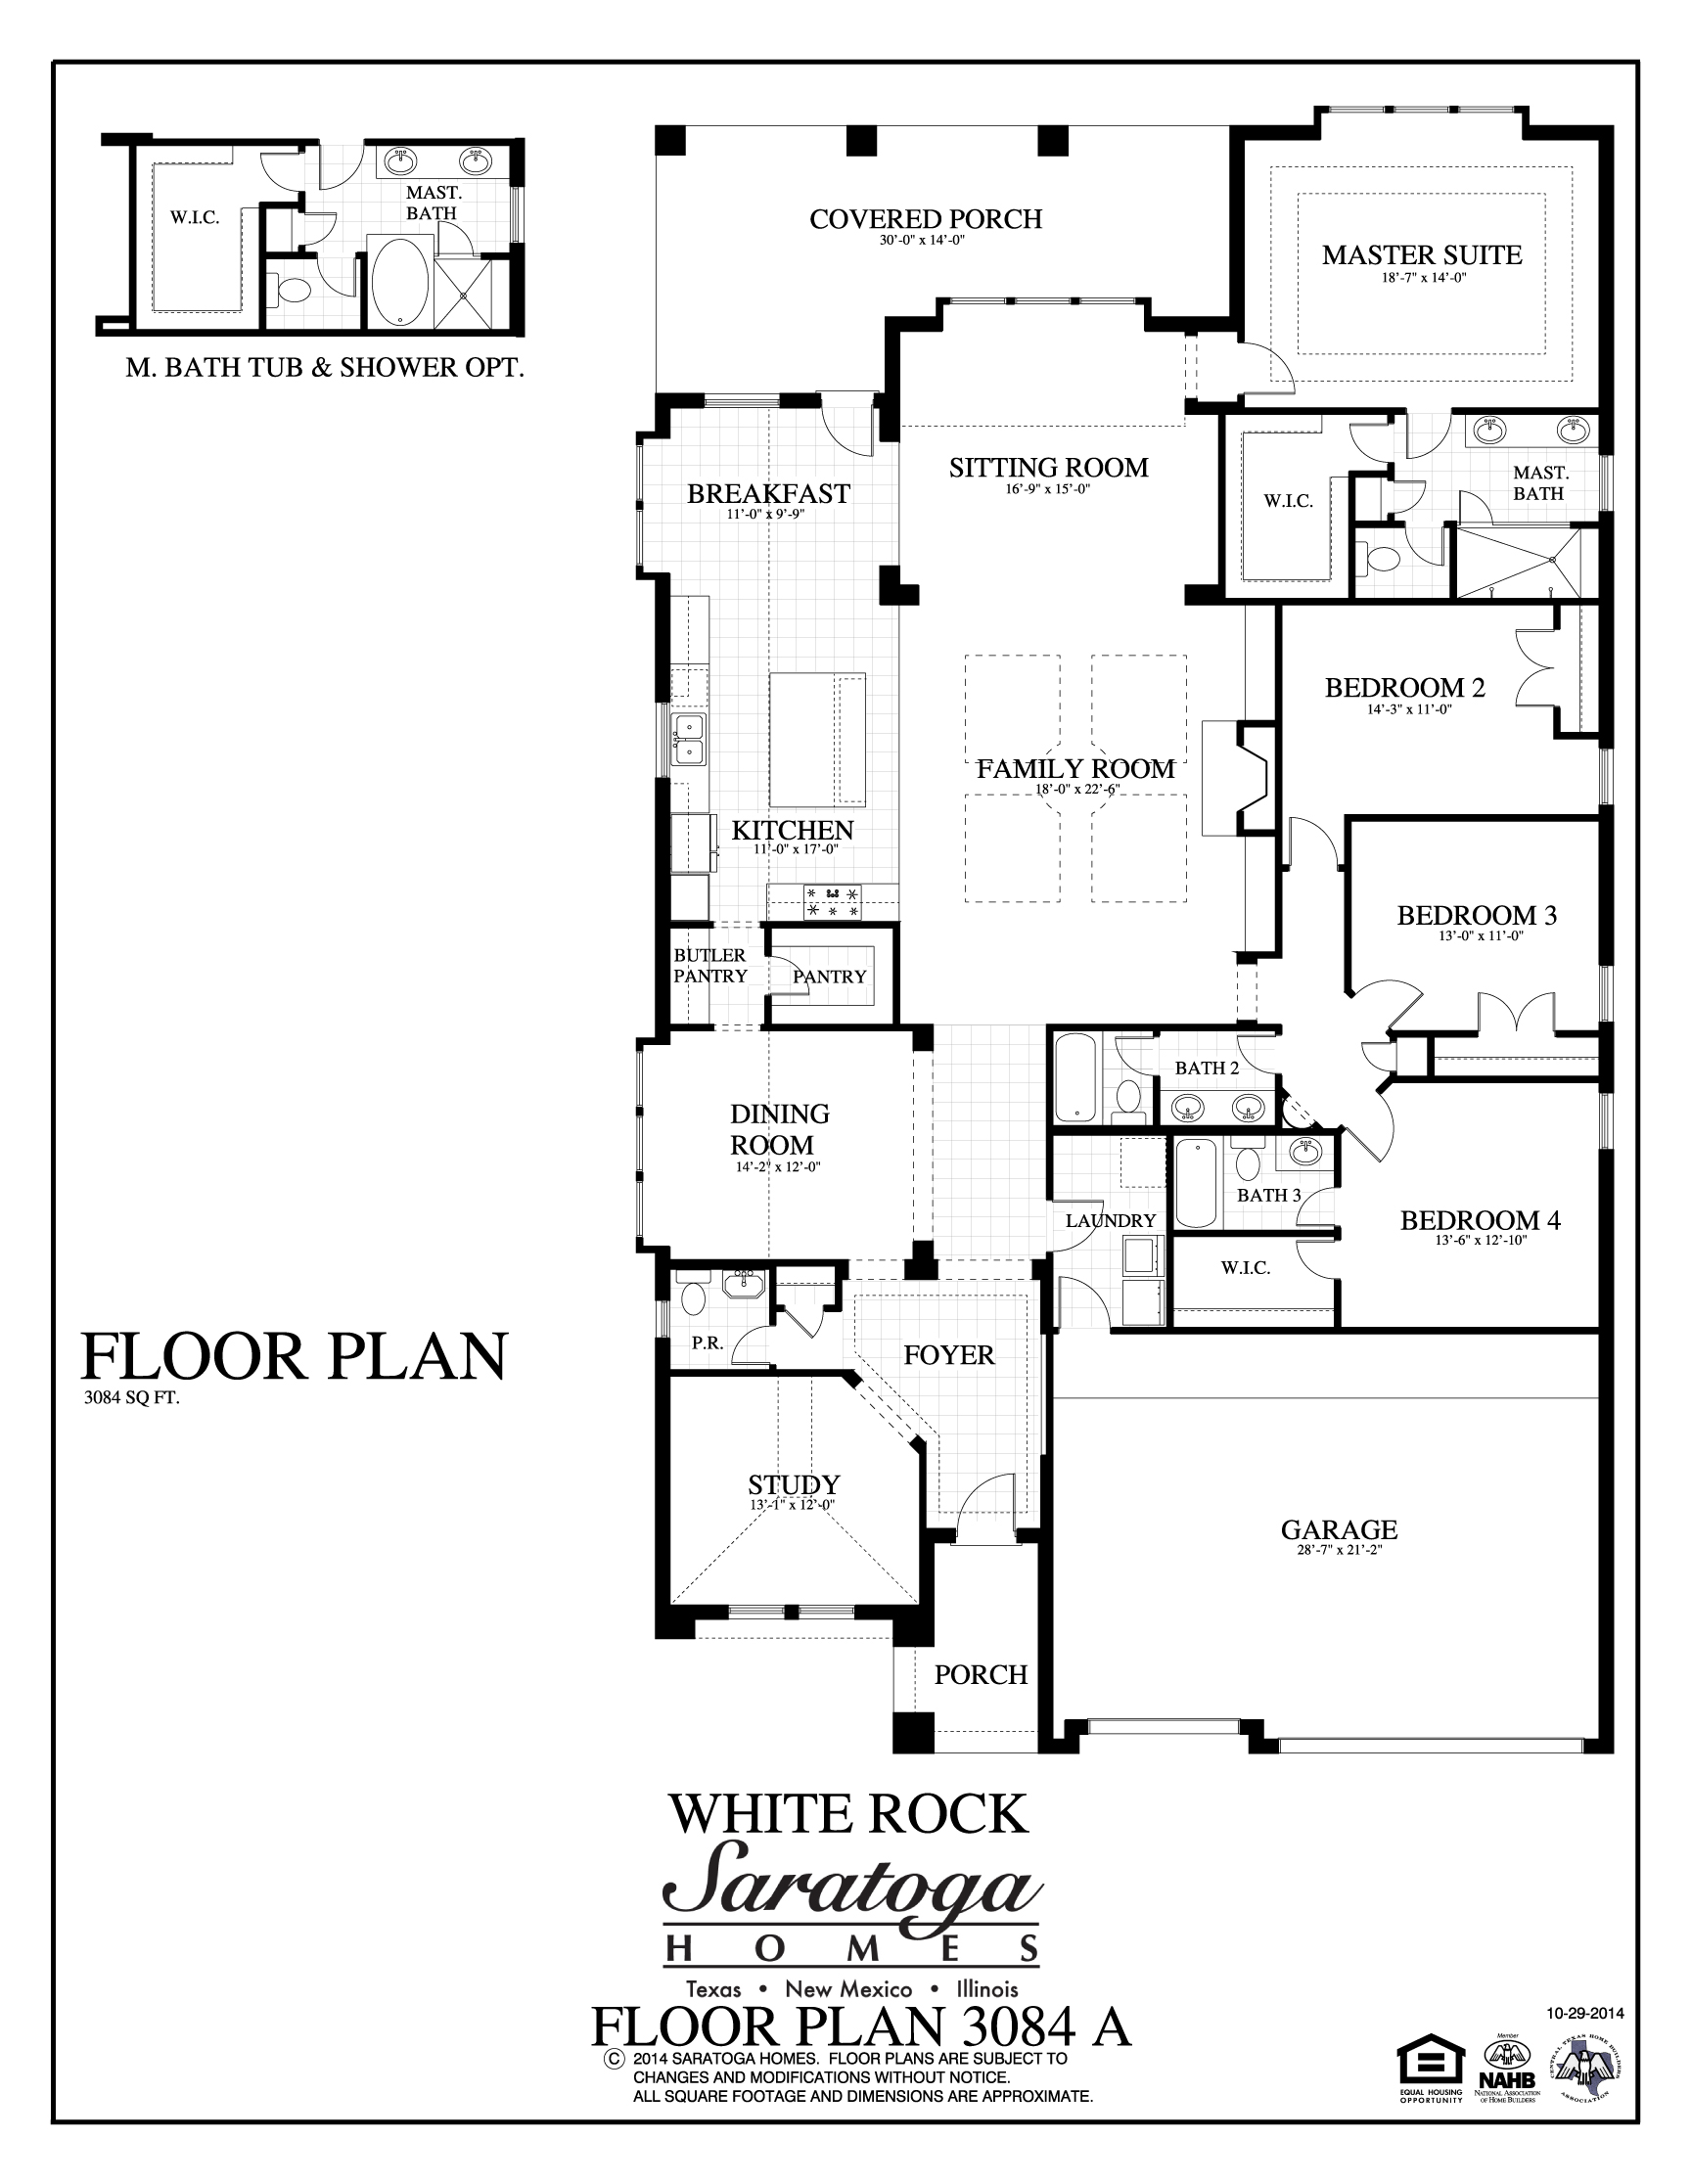 Plan 3084 a saratoga homes killeen for Saratoga homes floor plans